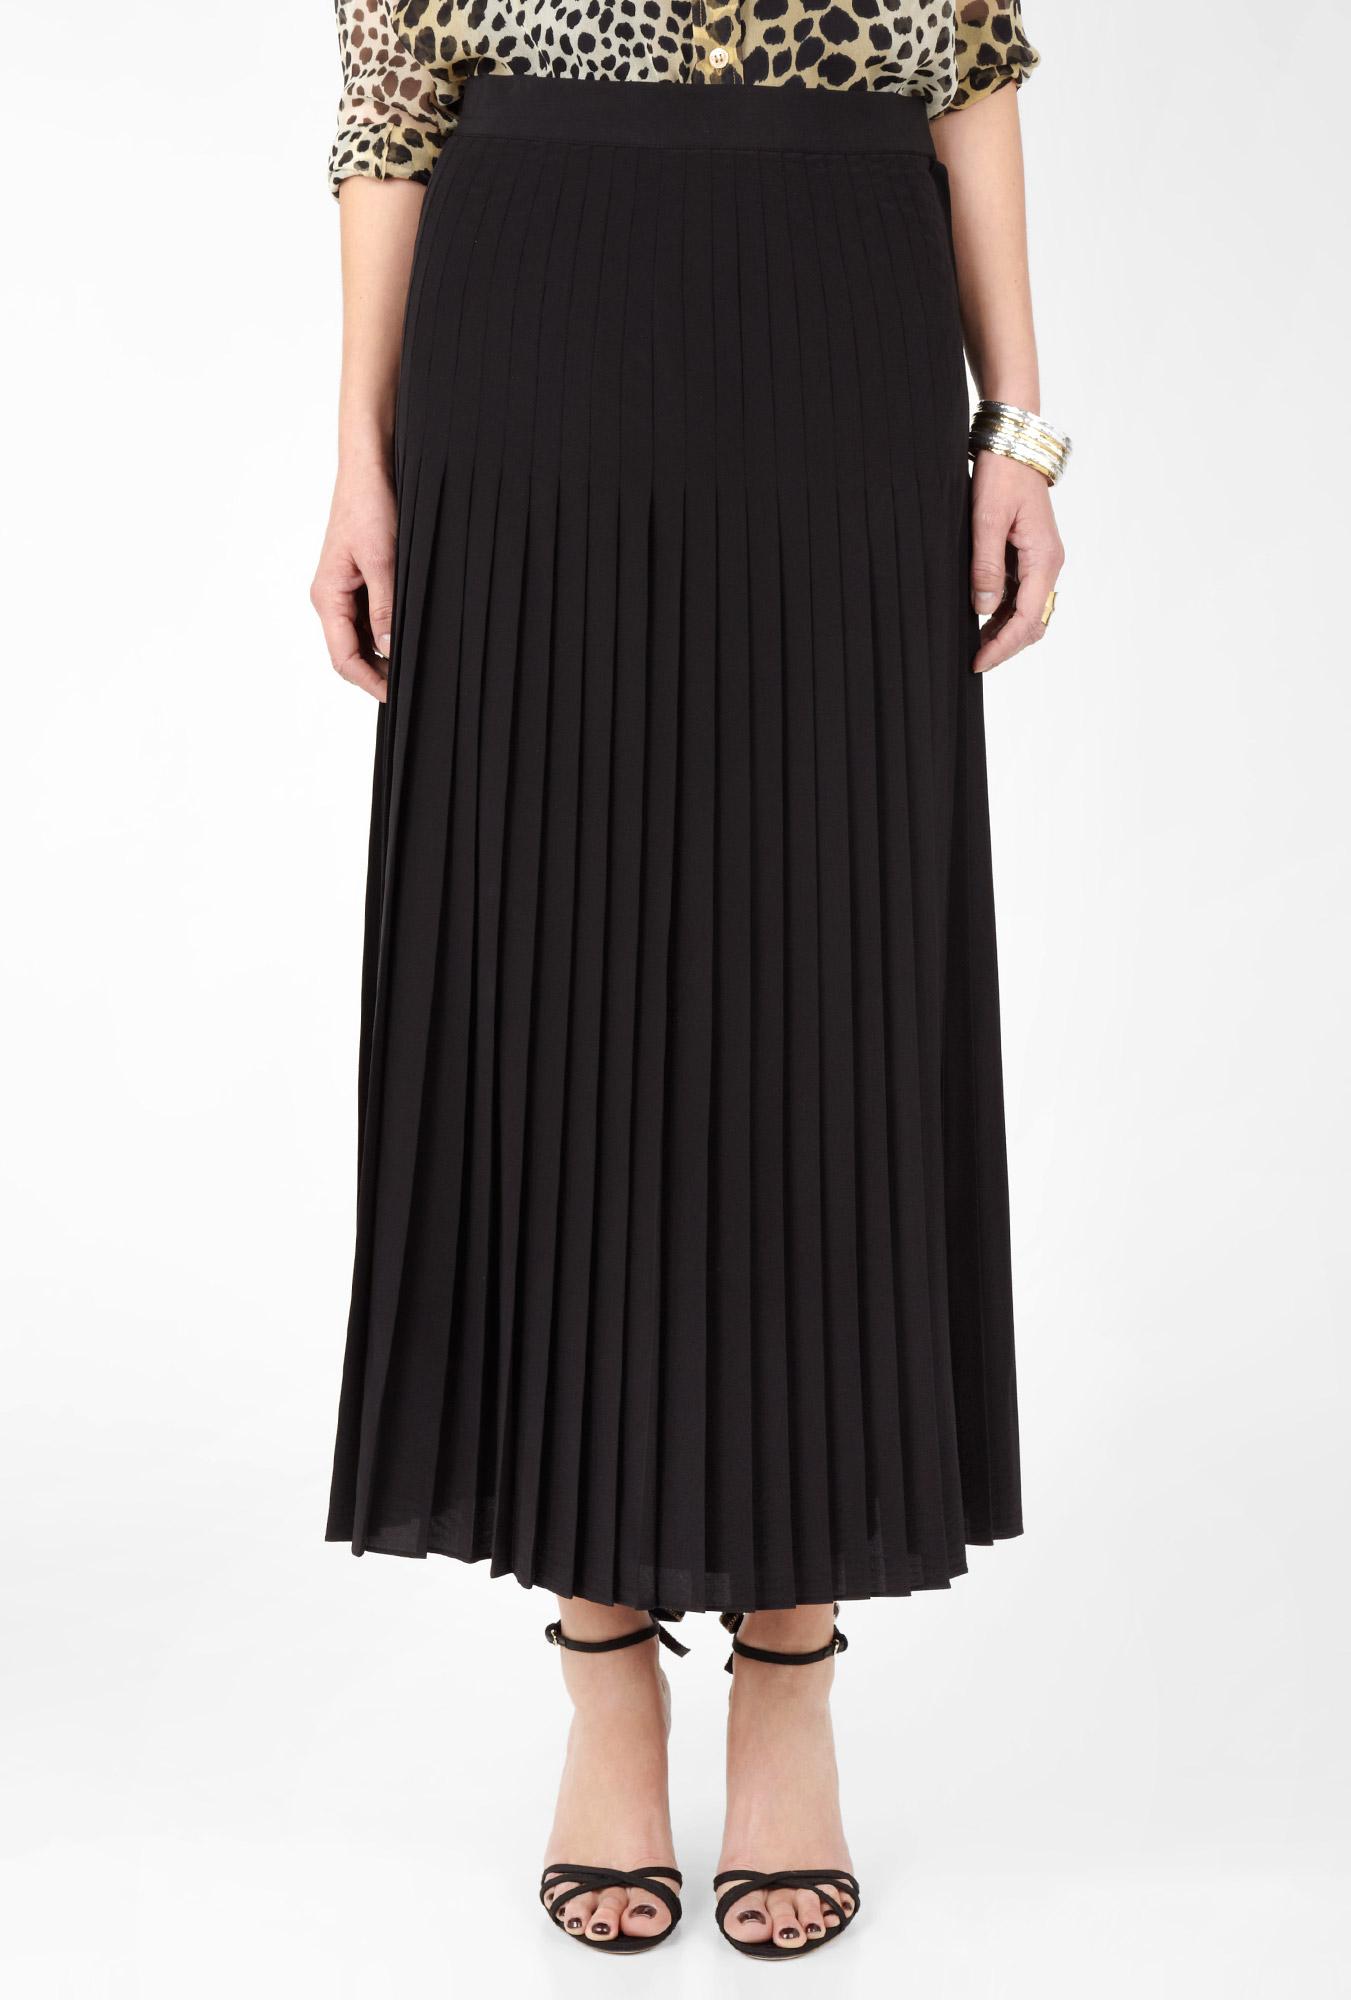 dkny black pleated maxi skirt in black lyst